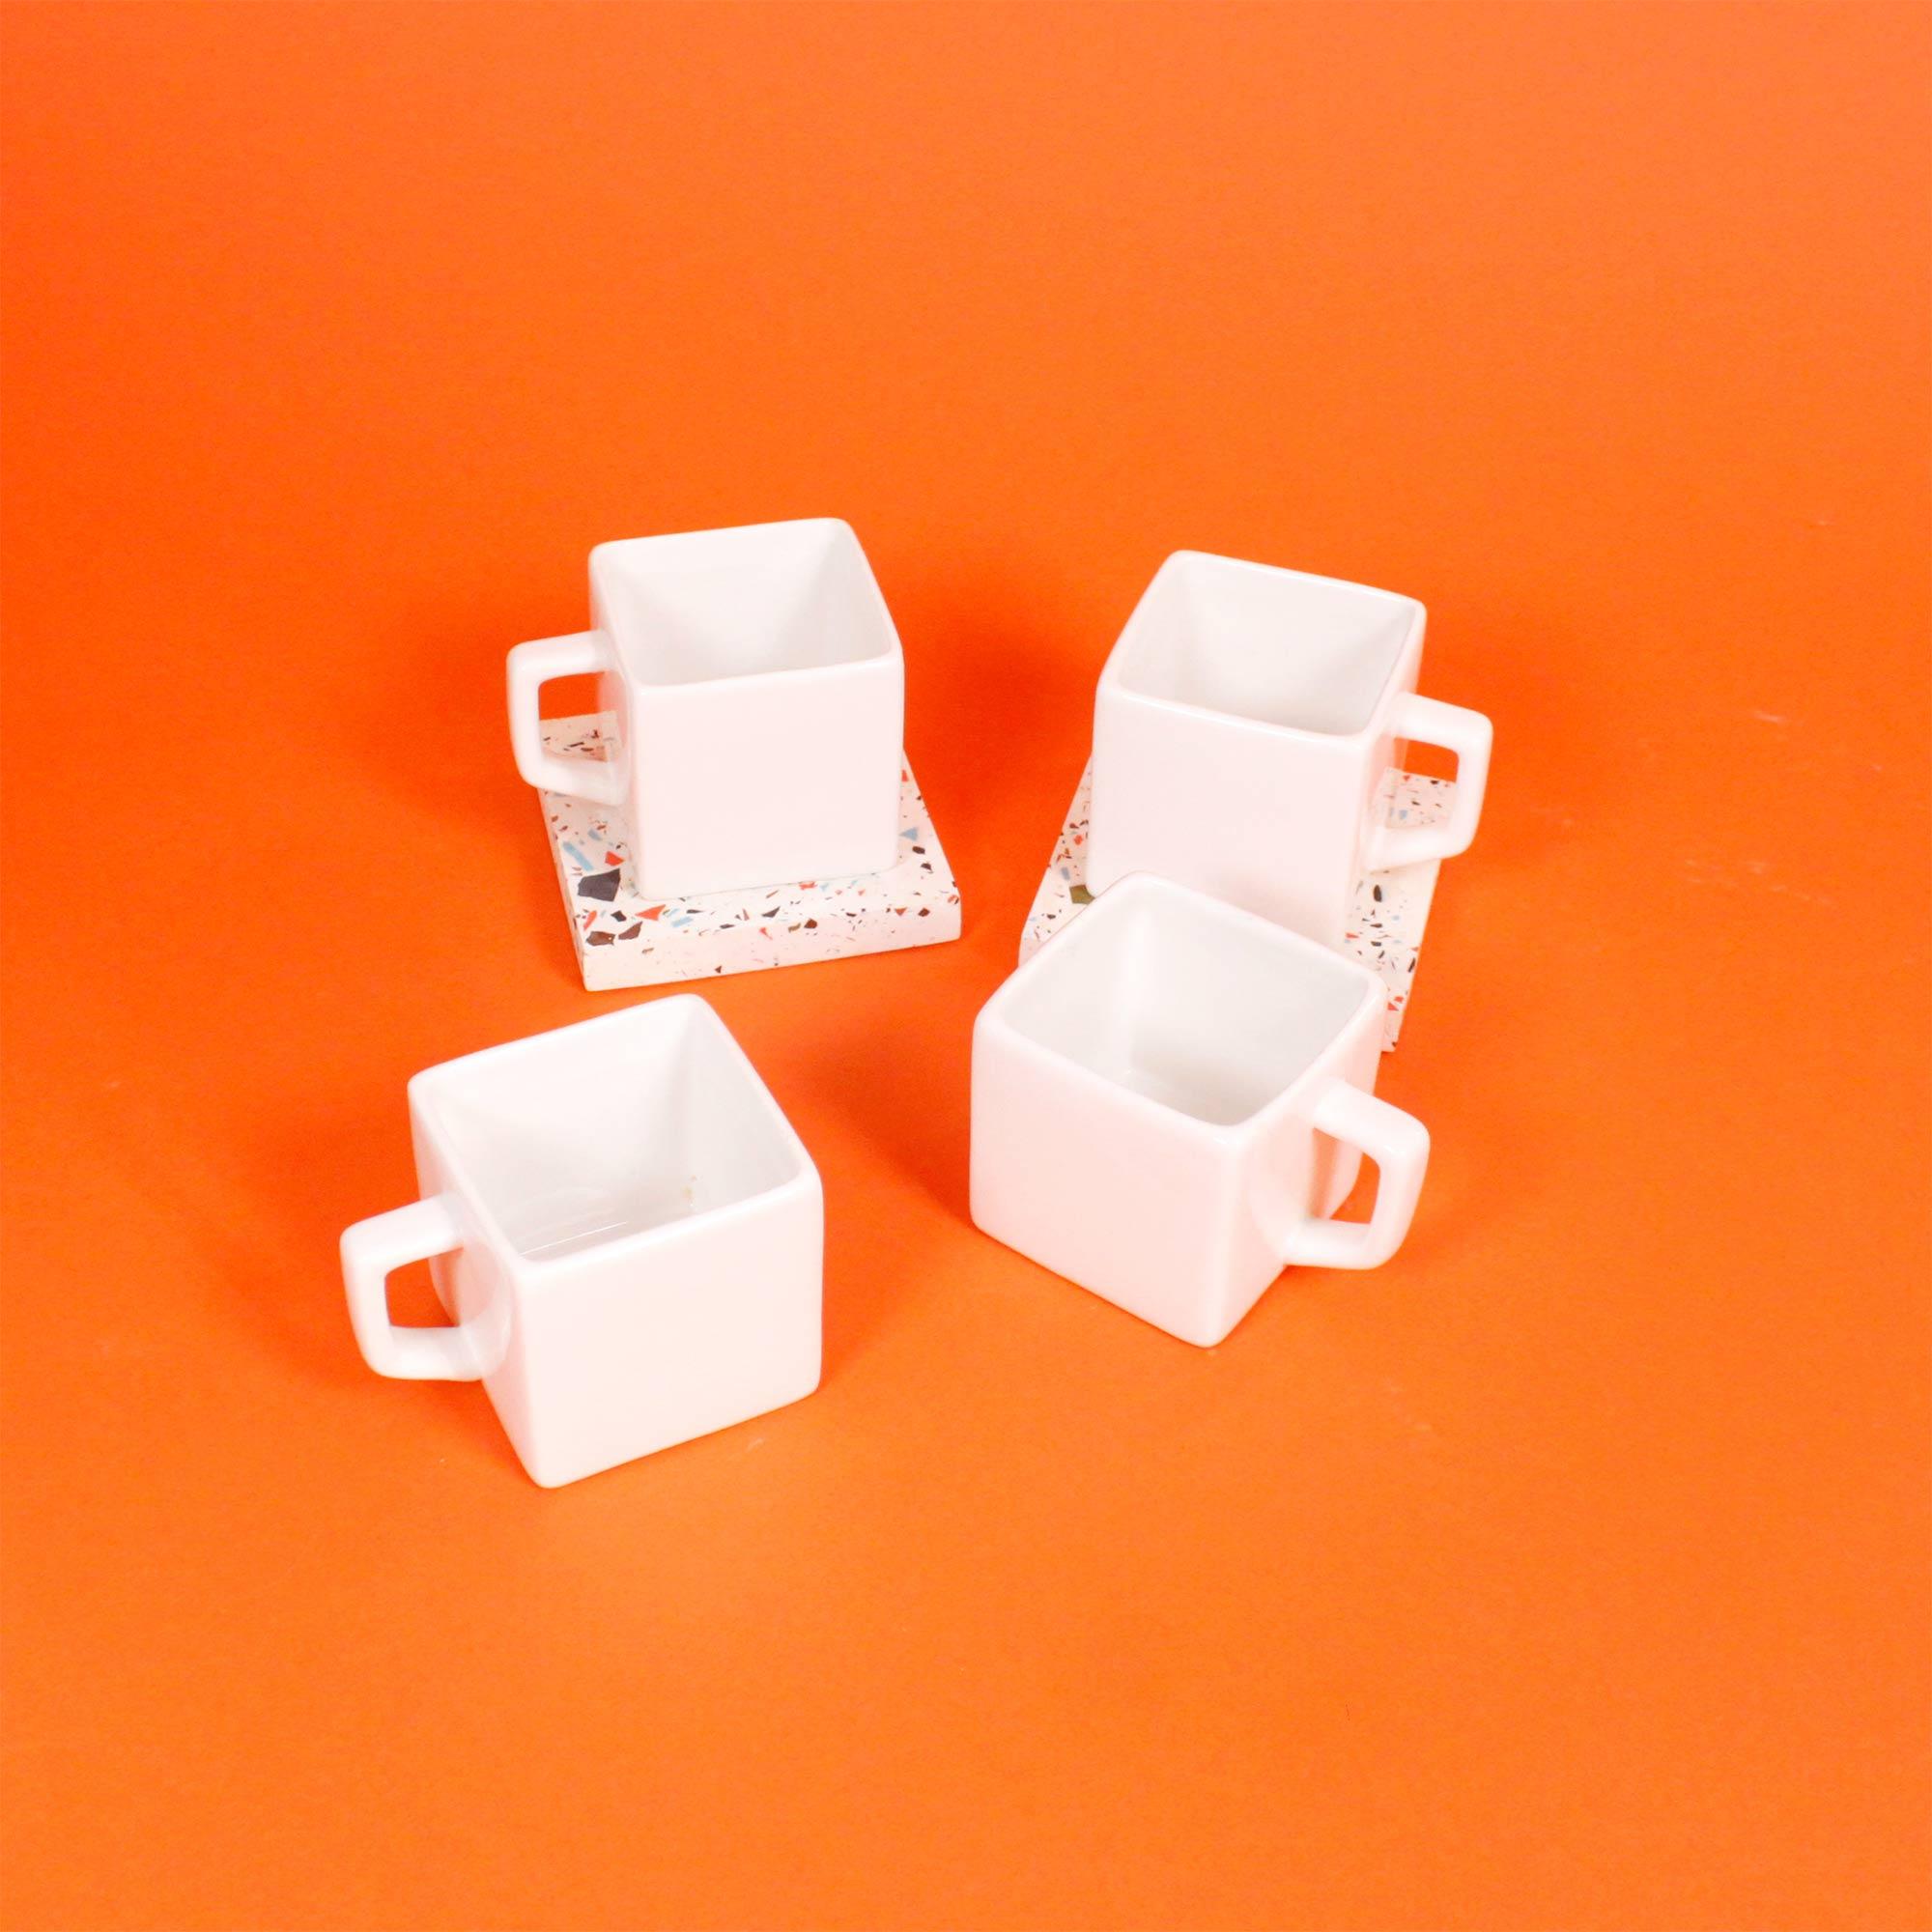 VINTAGE-CUPS-GEOMETRIC-CUBE-WHITE-MINIMALIST-BAUHAUS-80S-COOL-MACHINE-CONCEPT-STORE-4